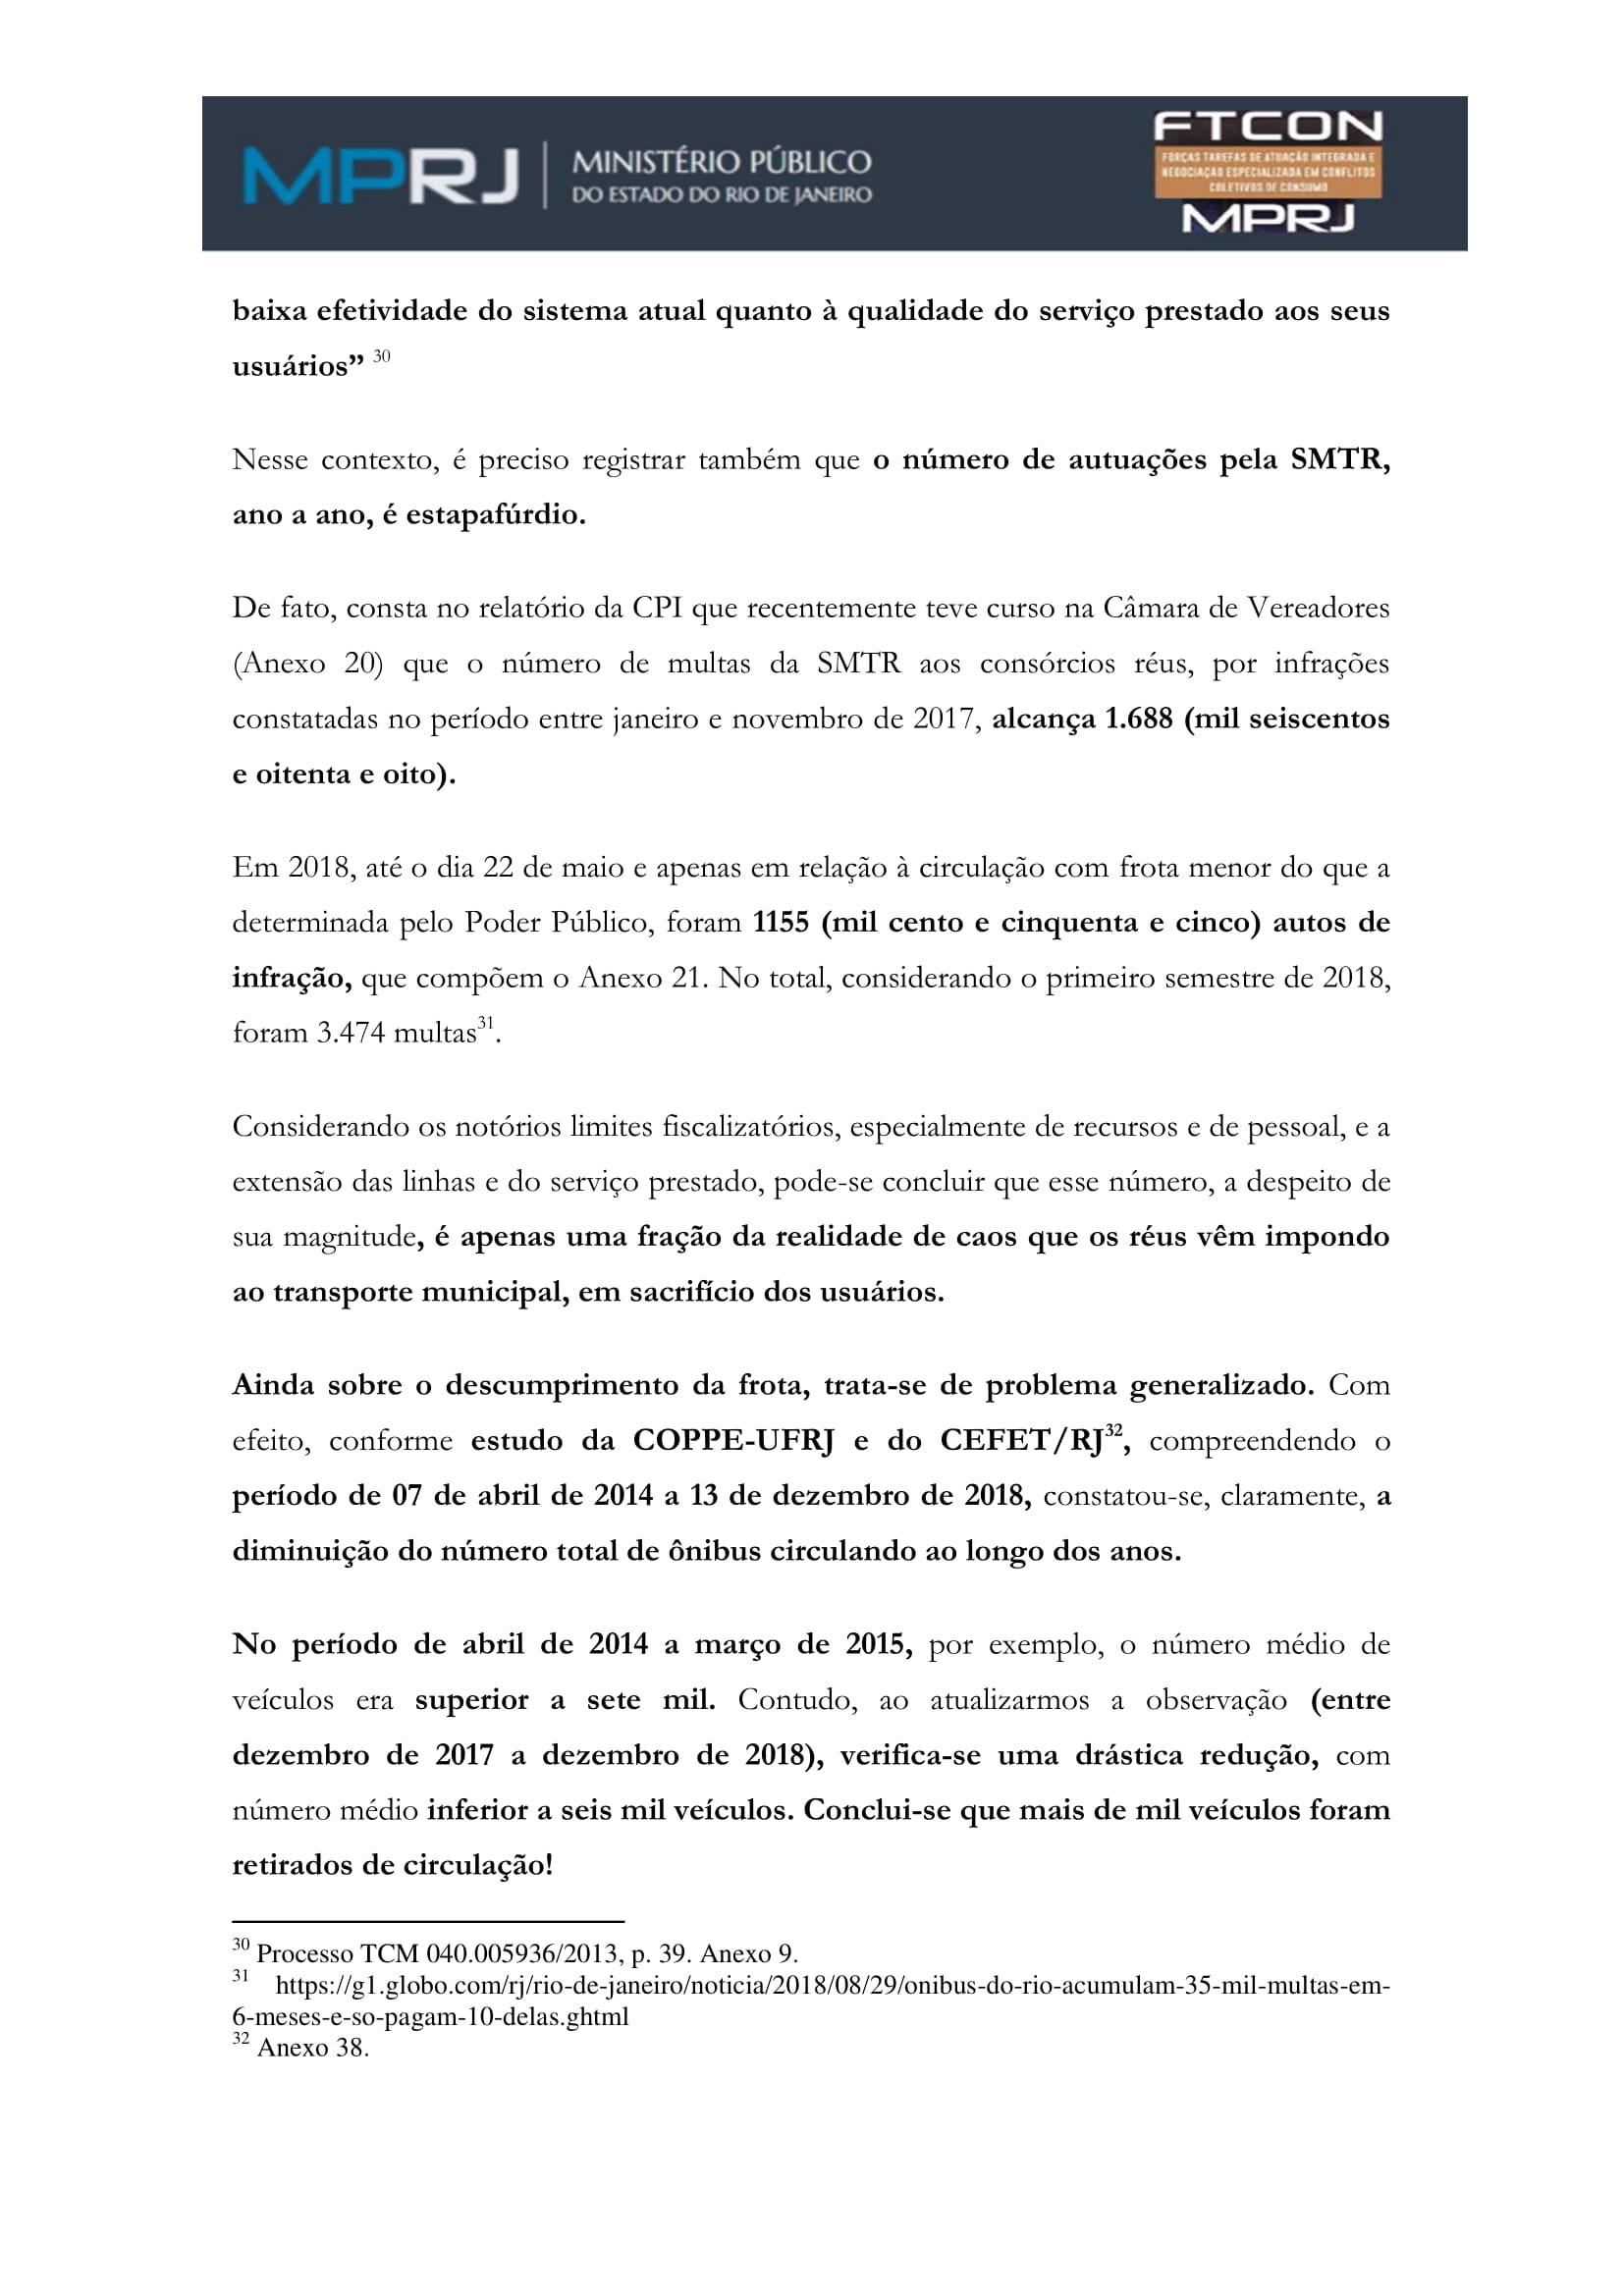 acp_caducidade_onibus_dr_rt-031